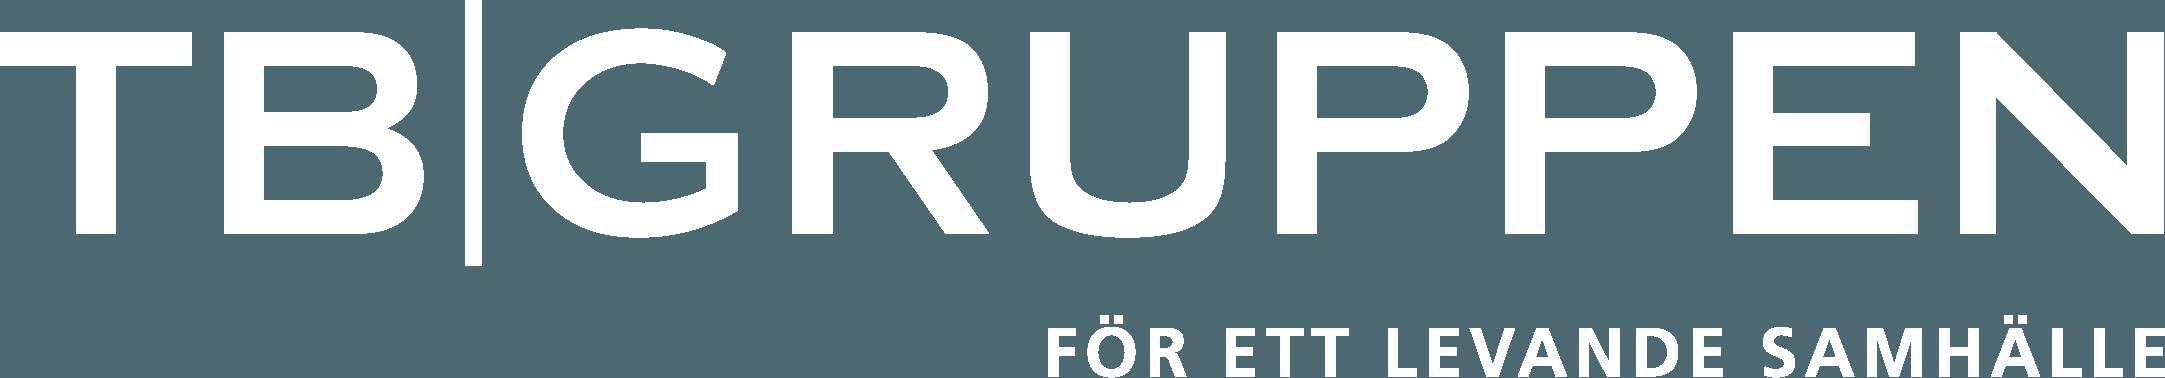 TB-Gruppen Liggande logotyp Vit